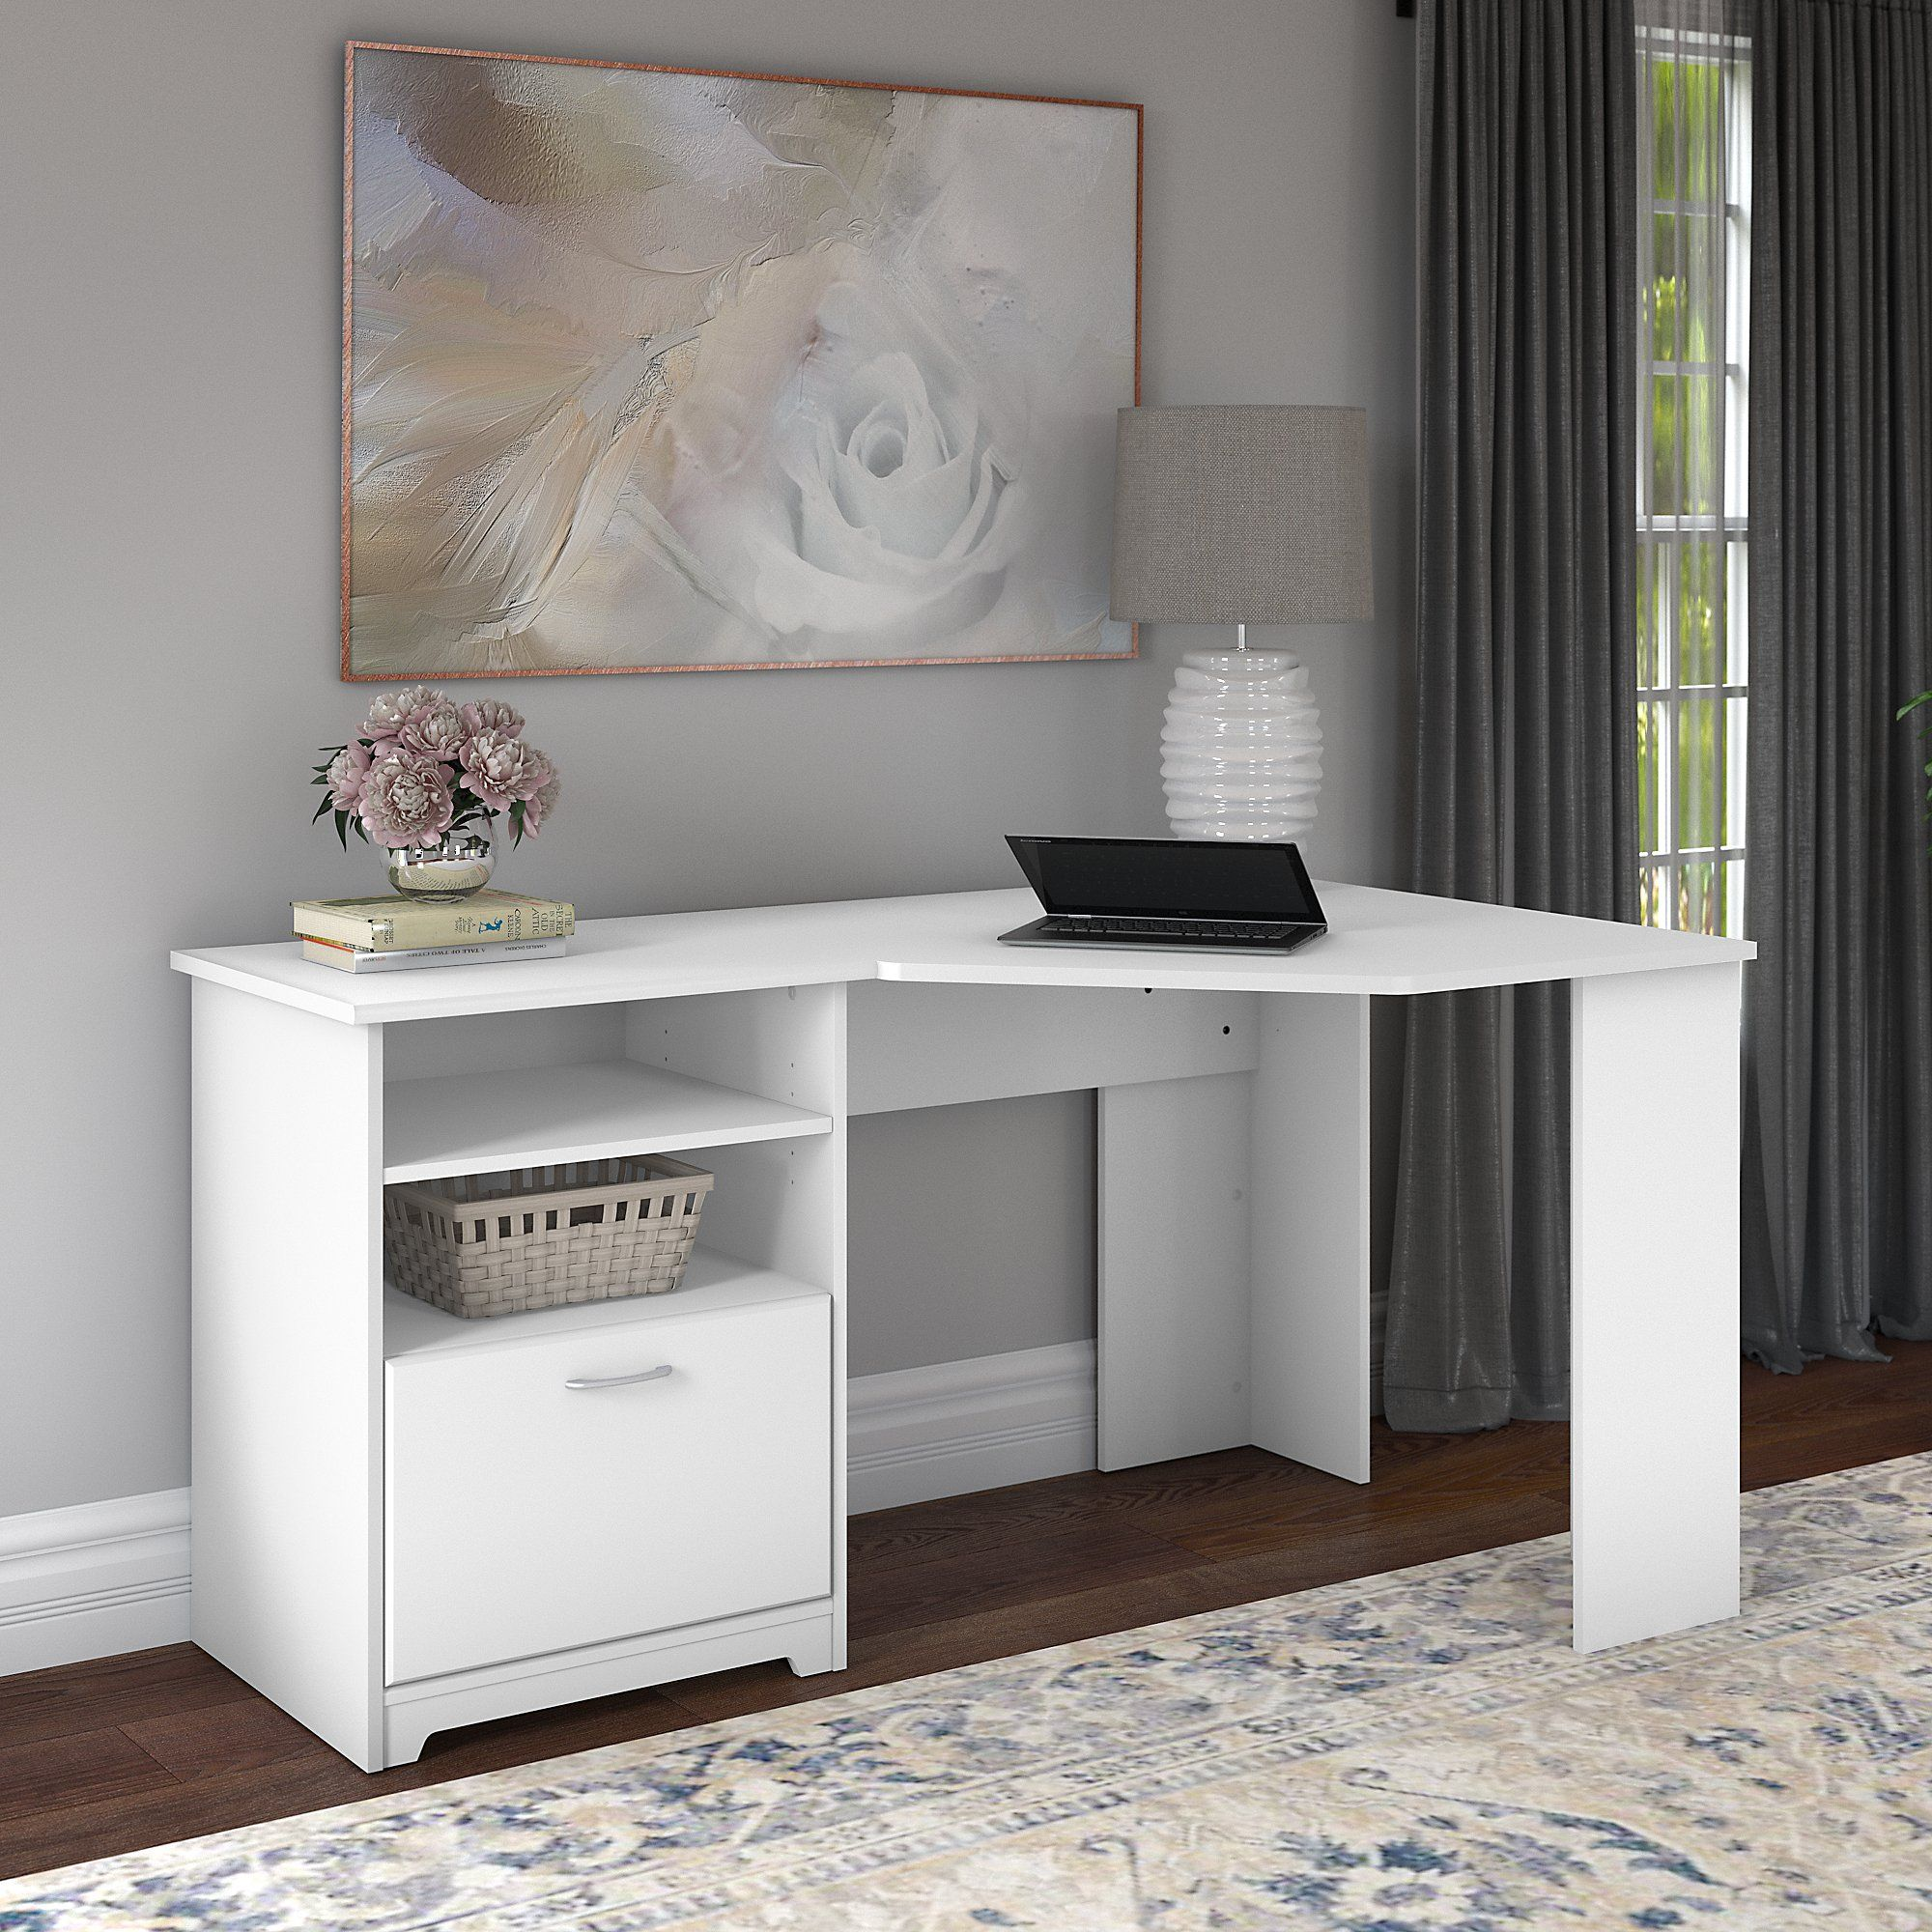 Bush Furniture Cabot 60w Corner Desk Walmart Com In 2020 Corner Desk Bush Furniture Desk